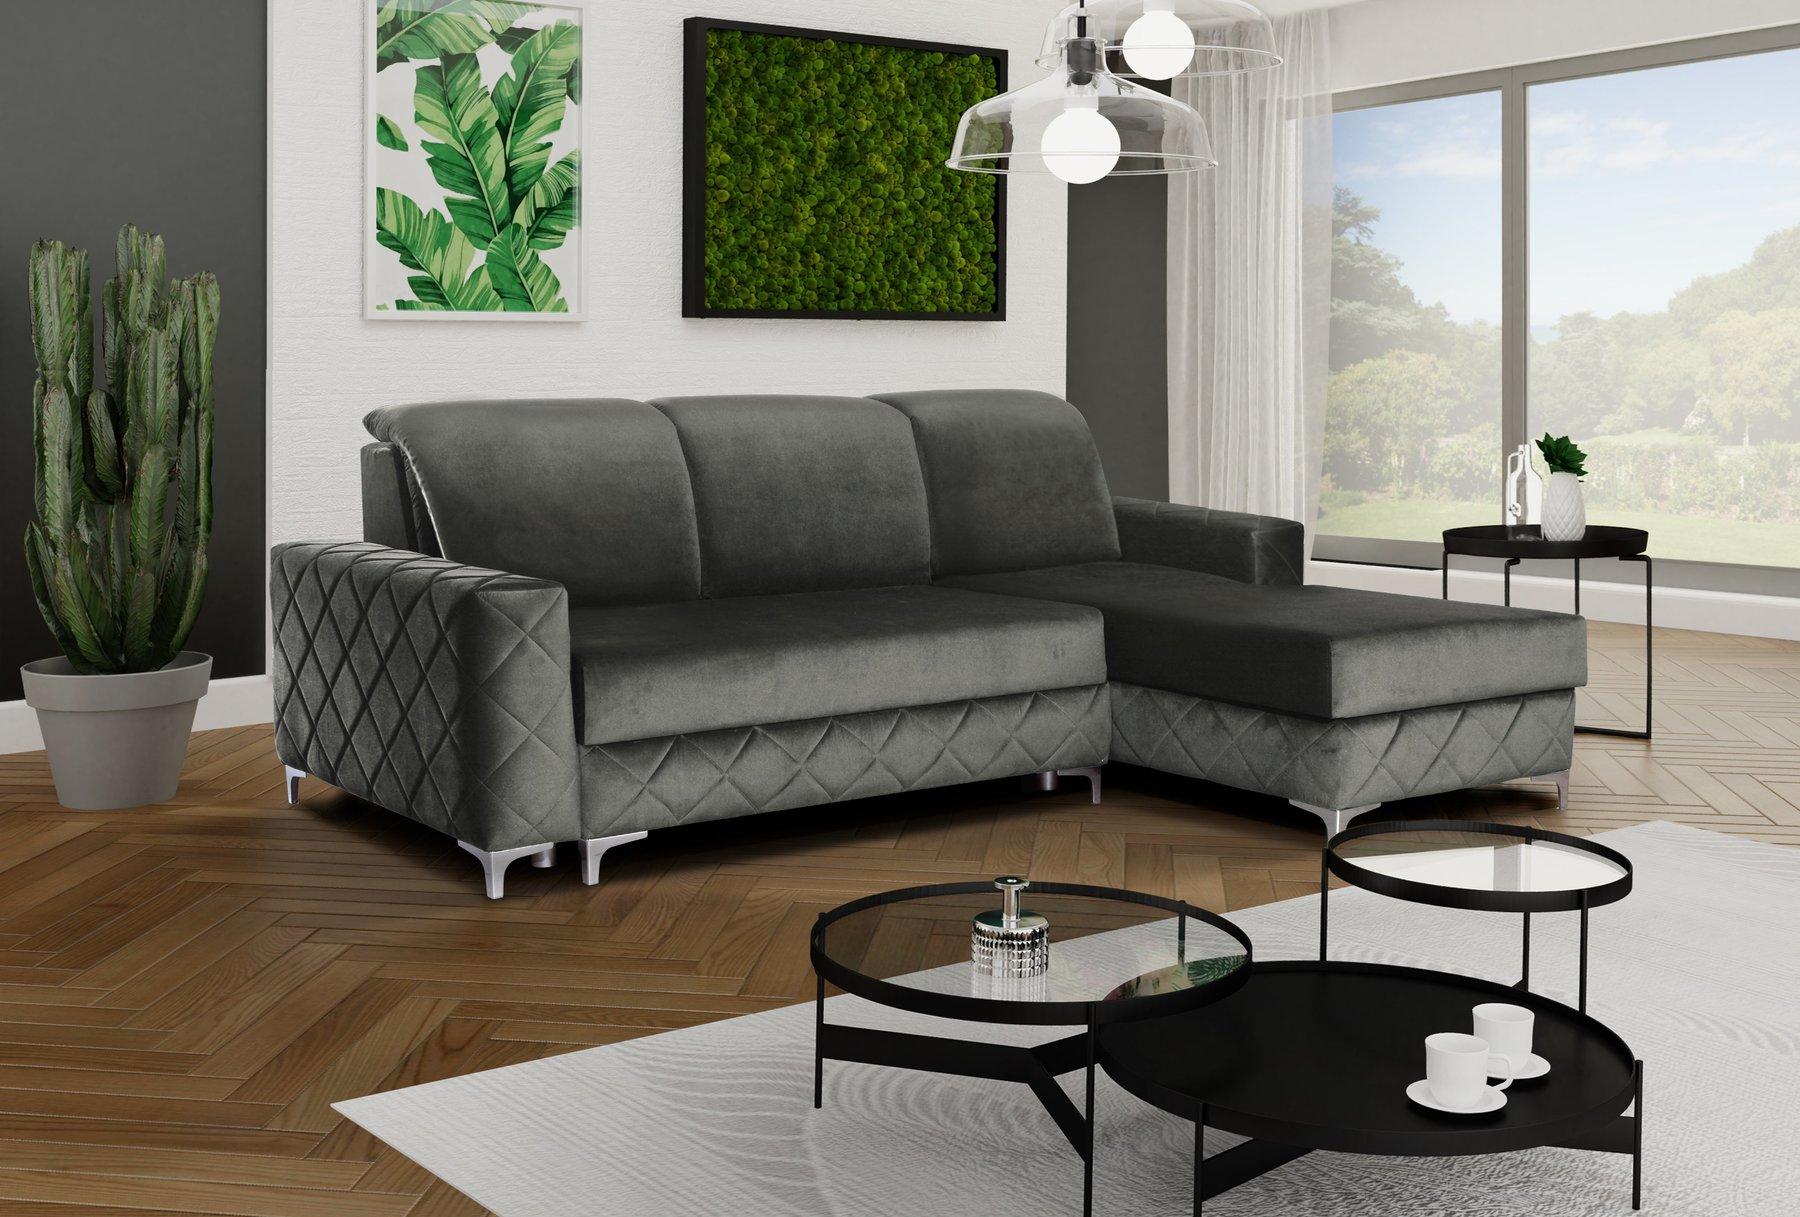 Alfredo Gray Sectional Sofa by Skyler Designs